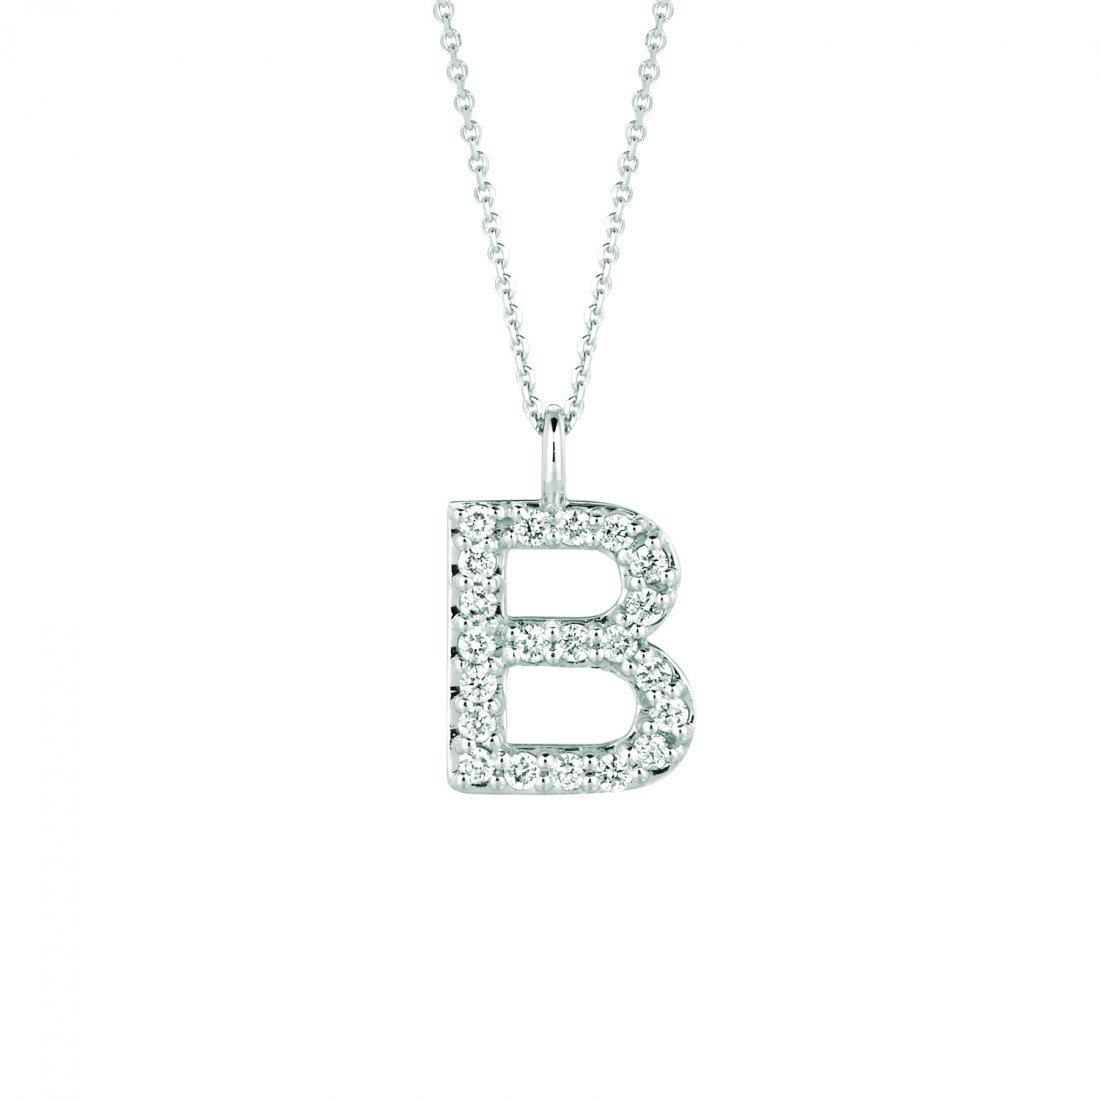 Diamond B necklace